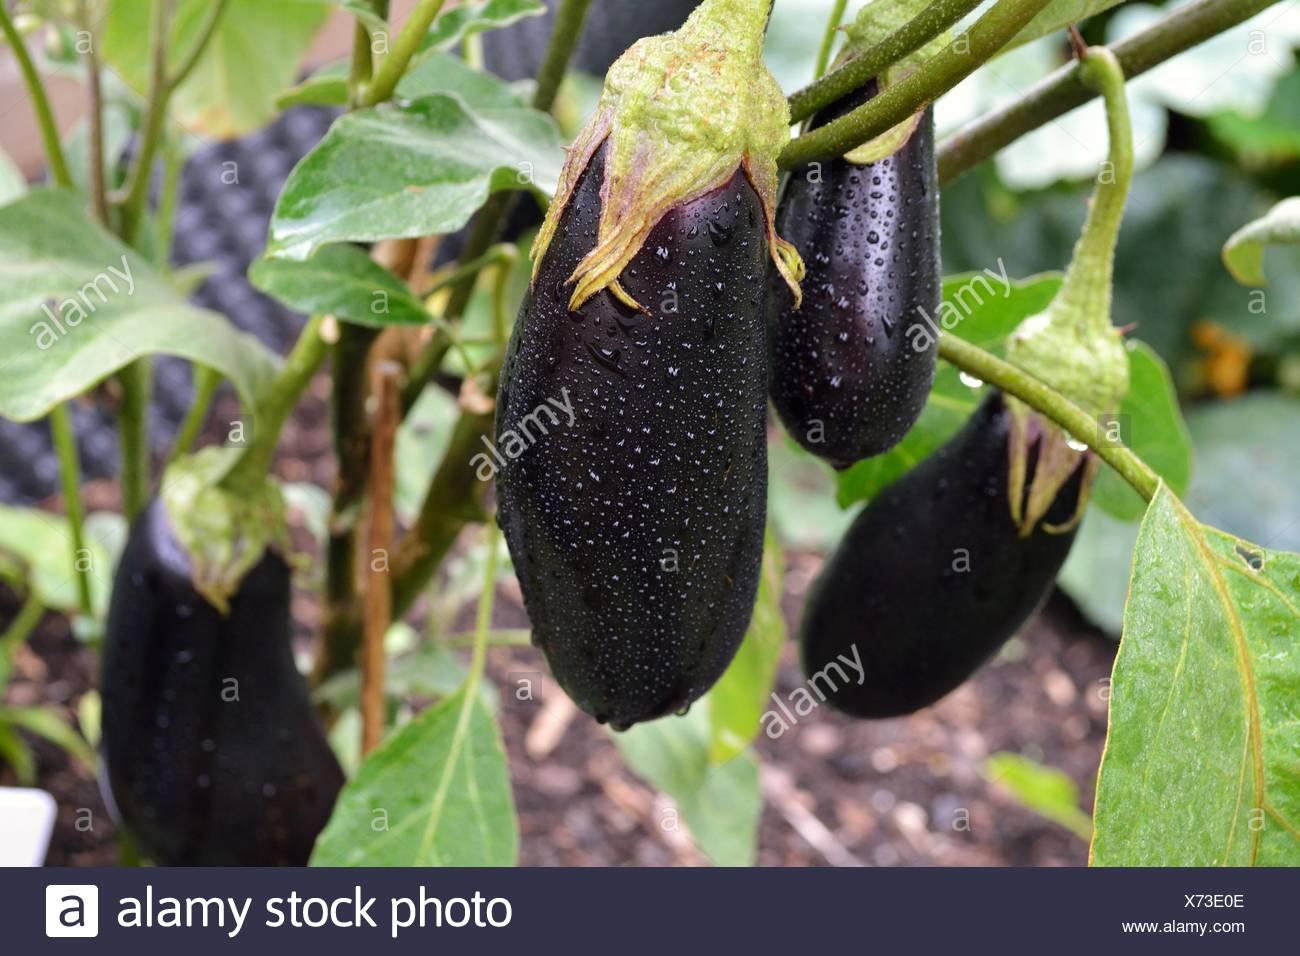 Eggplant in the garden Stock Photo